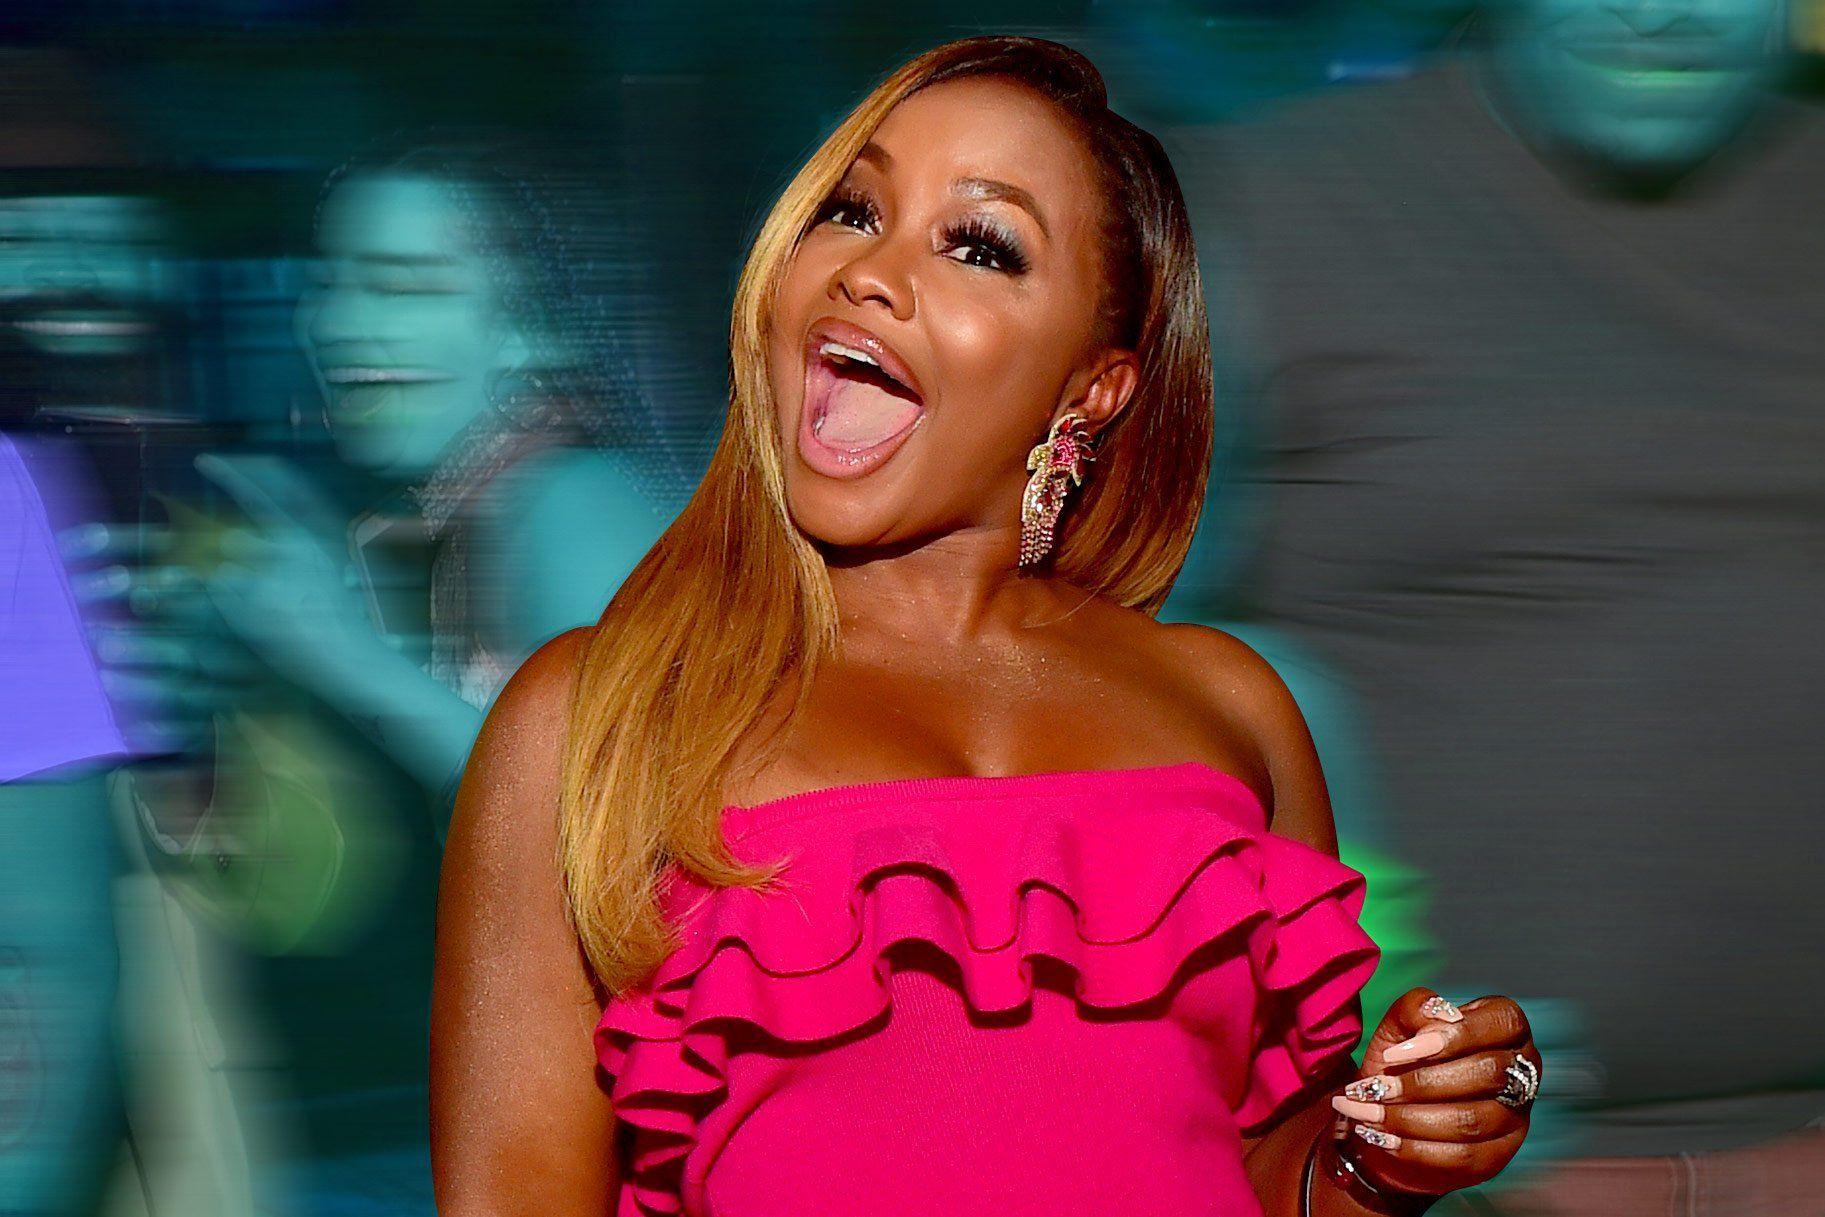 Phaedra Parks Has Fans Believing That She Might Be Getting Back On RHOA -  Phaedra Parks Has Fans Believing That She Might Be Getting Back On RHOA celebrityinsider…. #celeb - #believing #CelebrityNews #CelebrityPhotos #Fans #getting #JamieDornan #might #Parks #Phaedra #RHOA